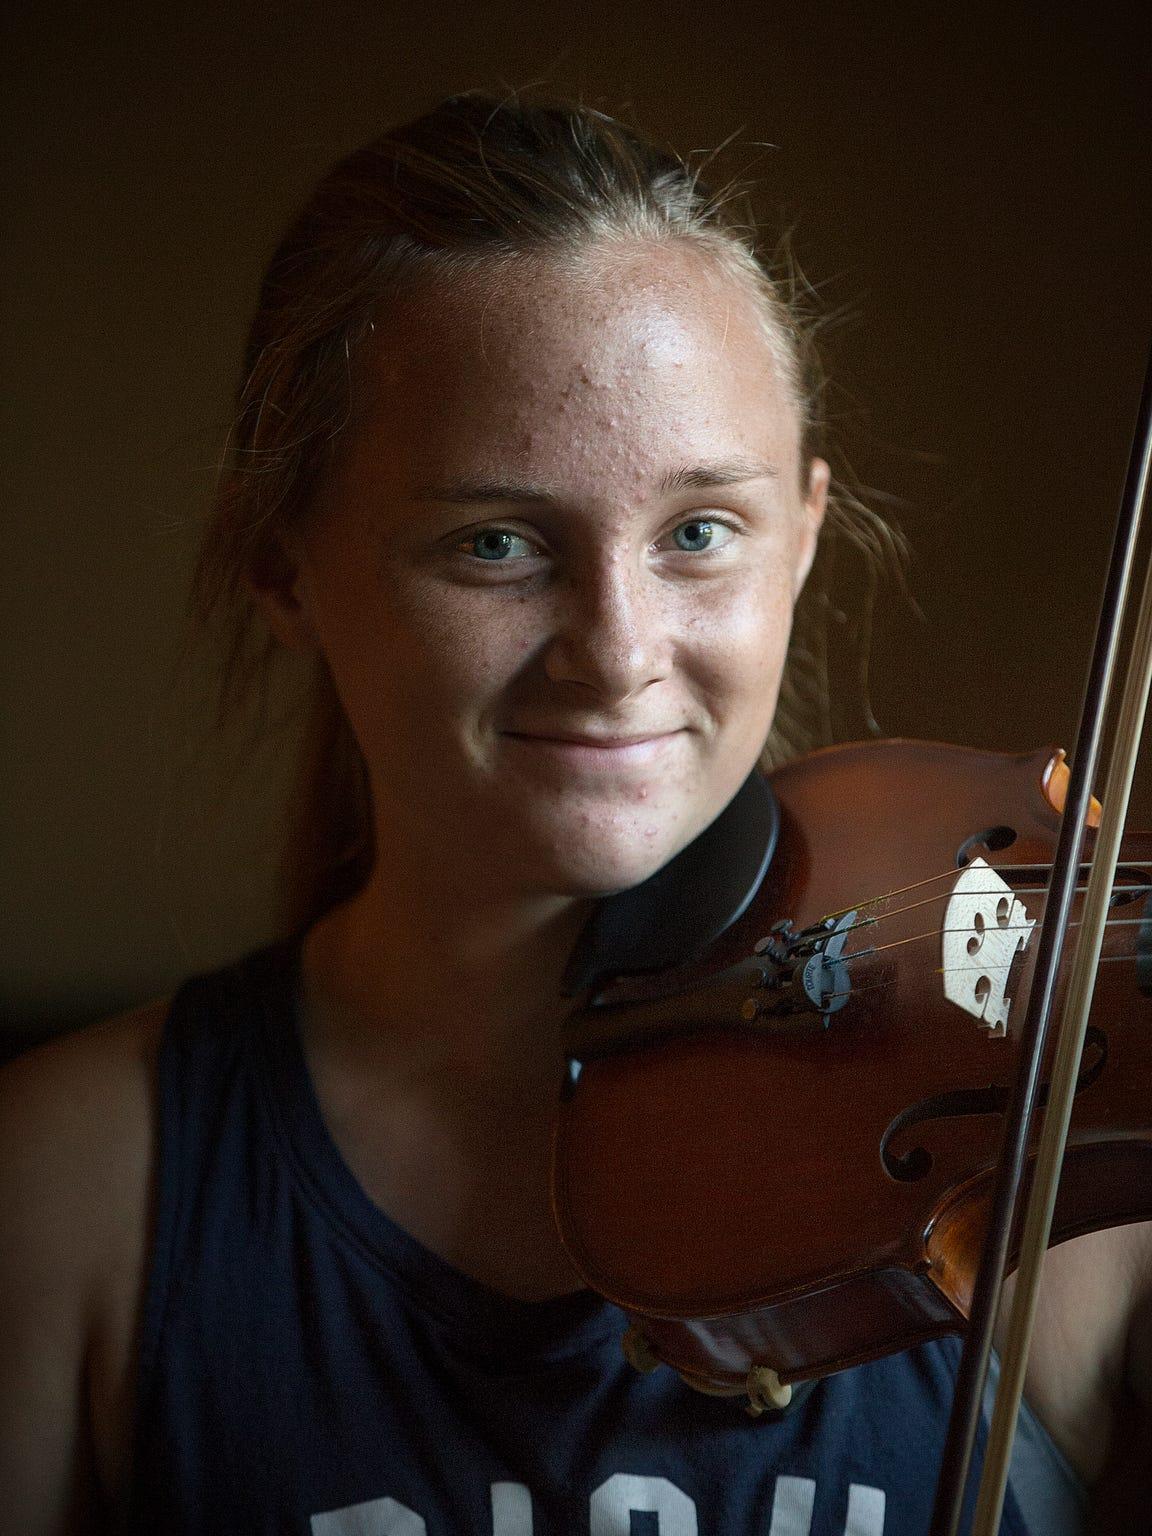 Caroline Kavanaugh poses with her violin for a portrait